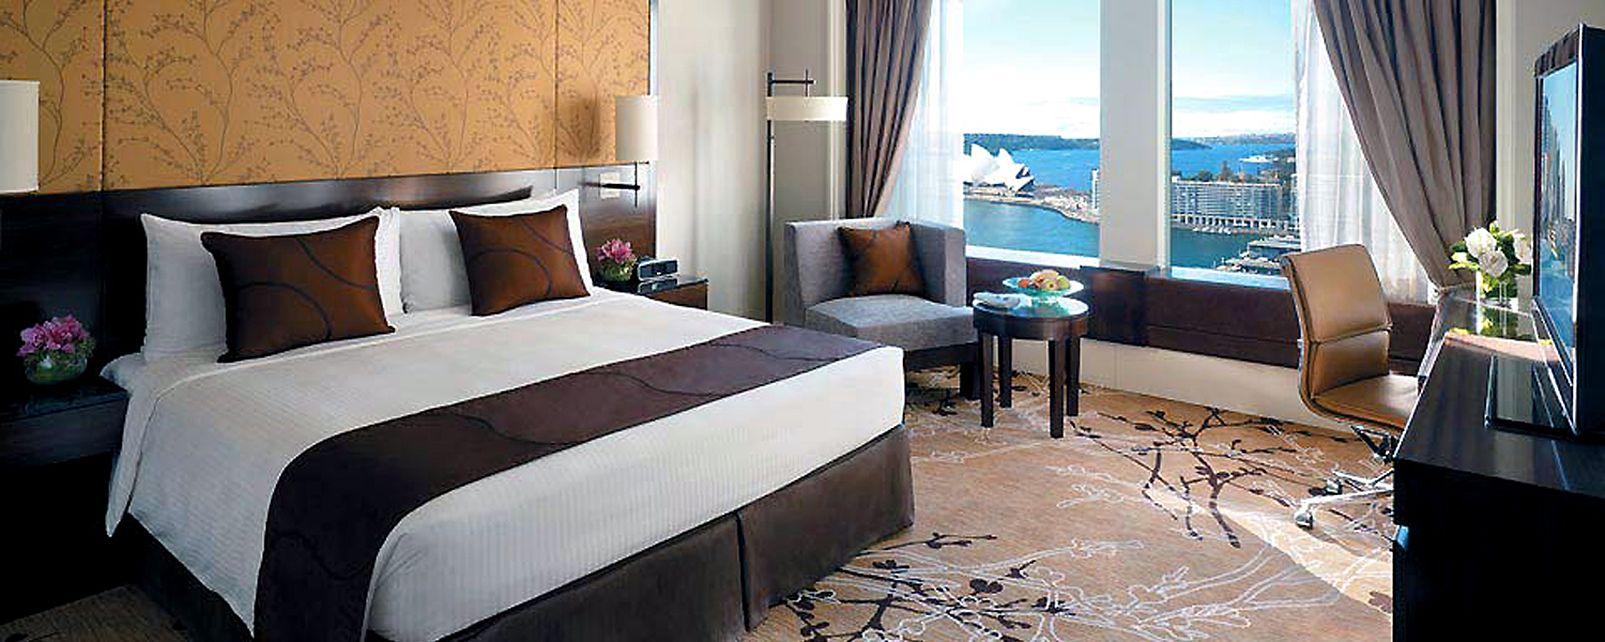 Hôtel Shangri-La Hotel Sydney